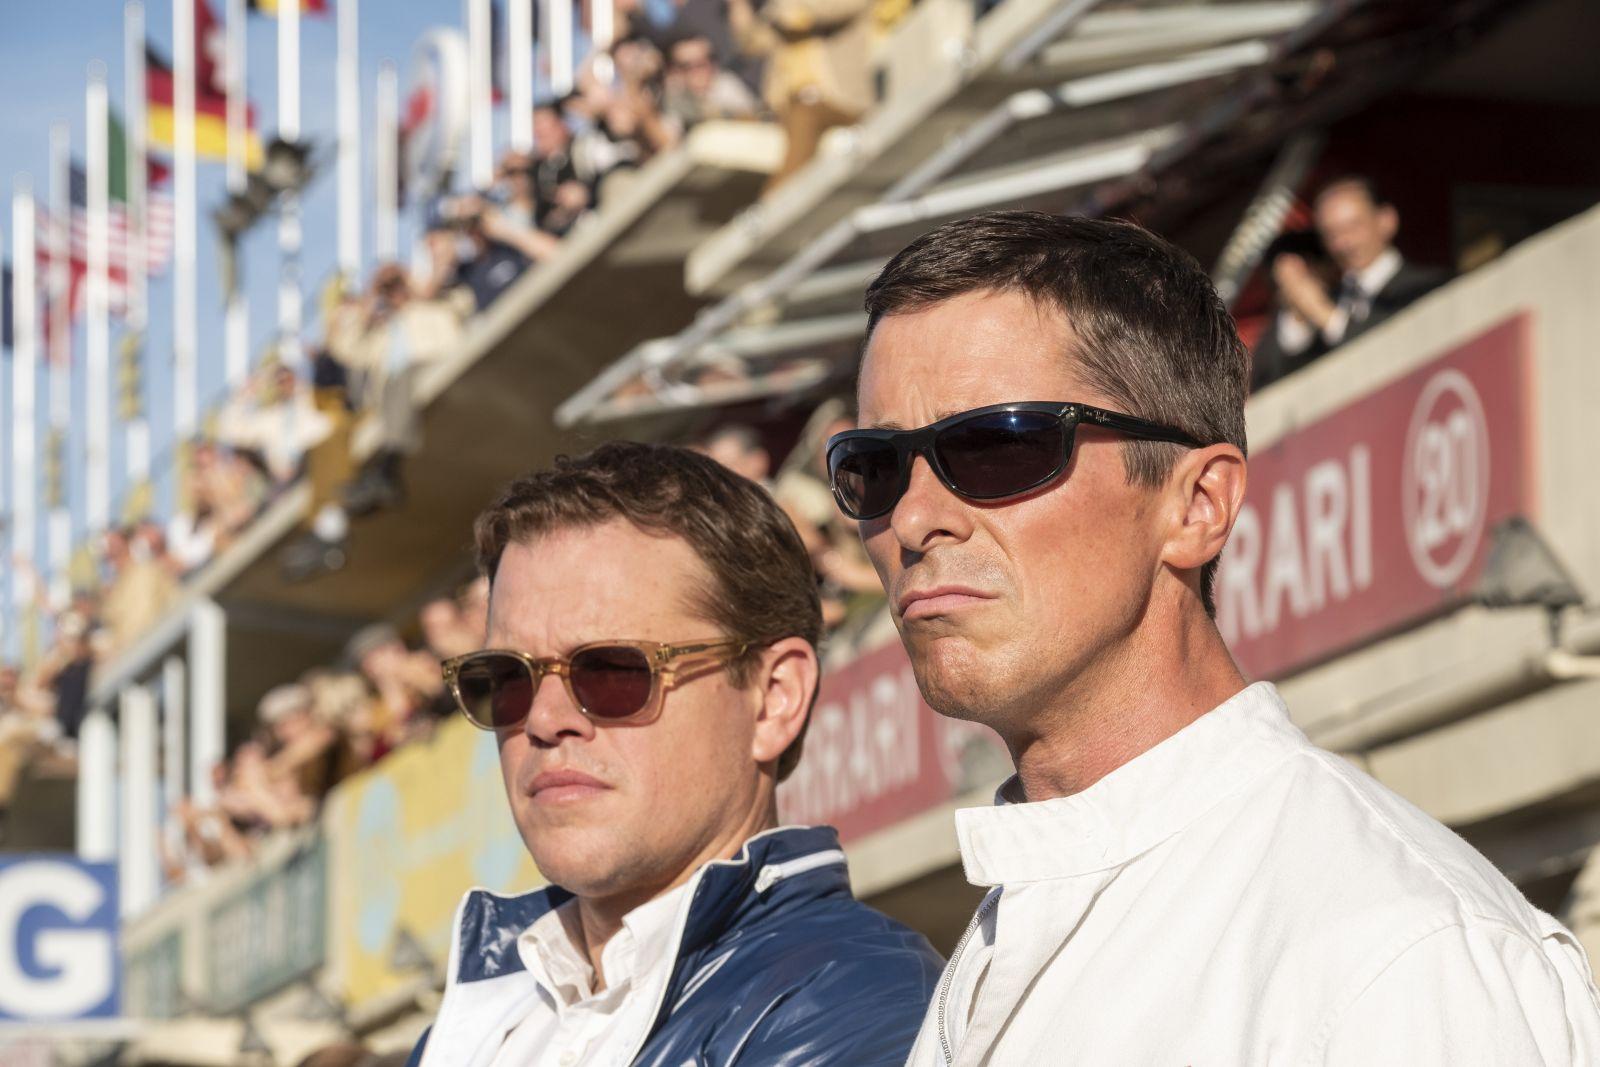 Matt Damon and Christian Bale in Twentieth Century FoxÕs FORD V. FERRARI.